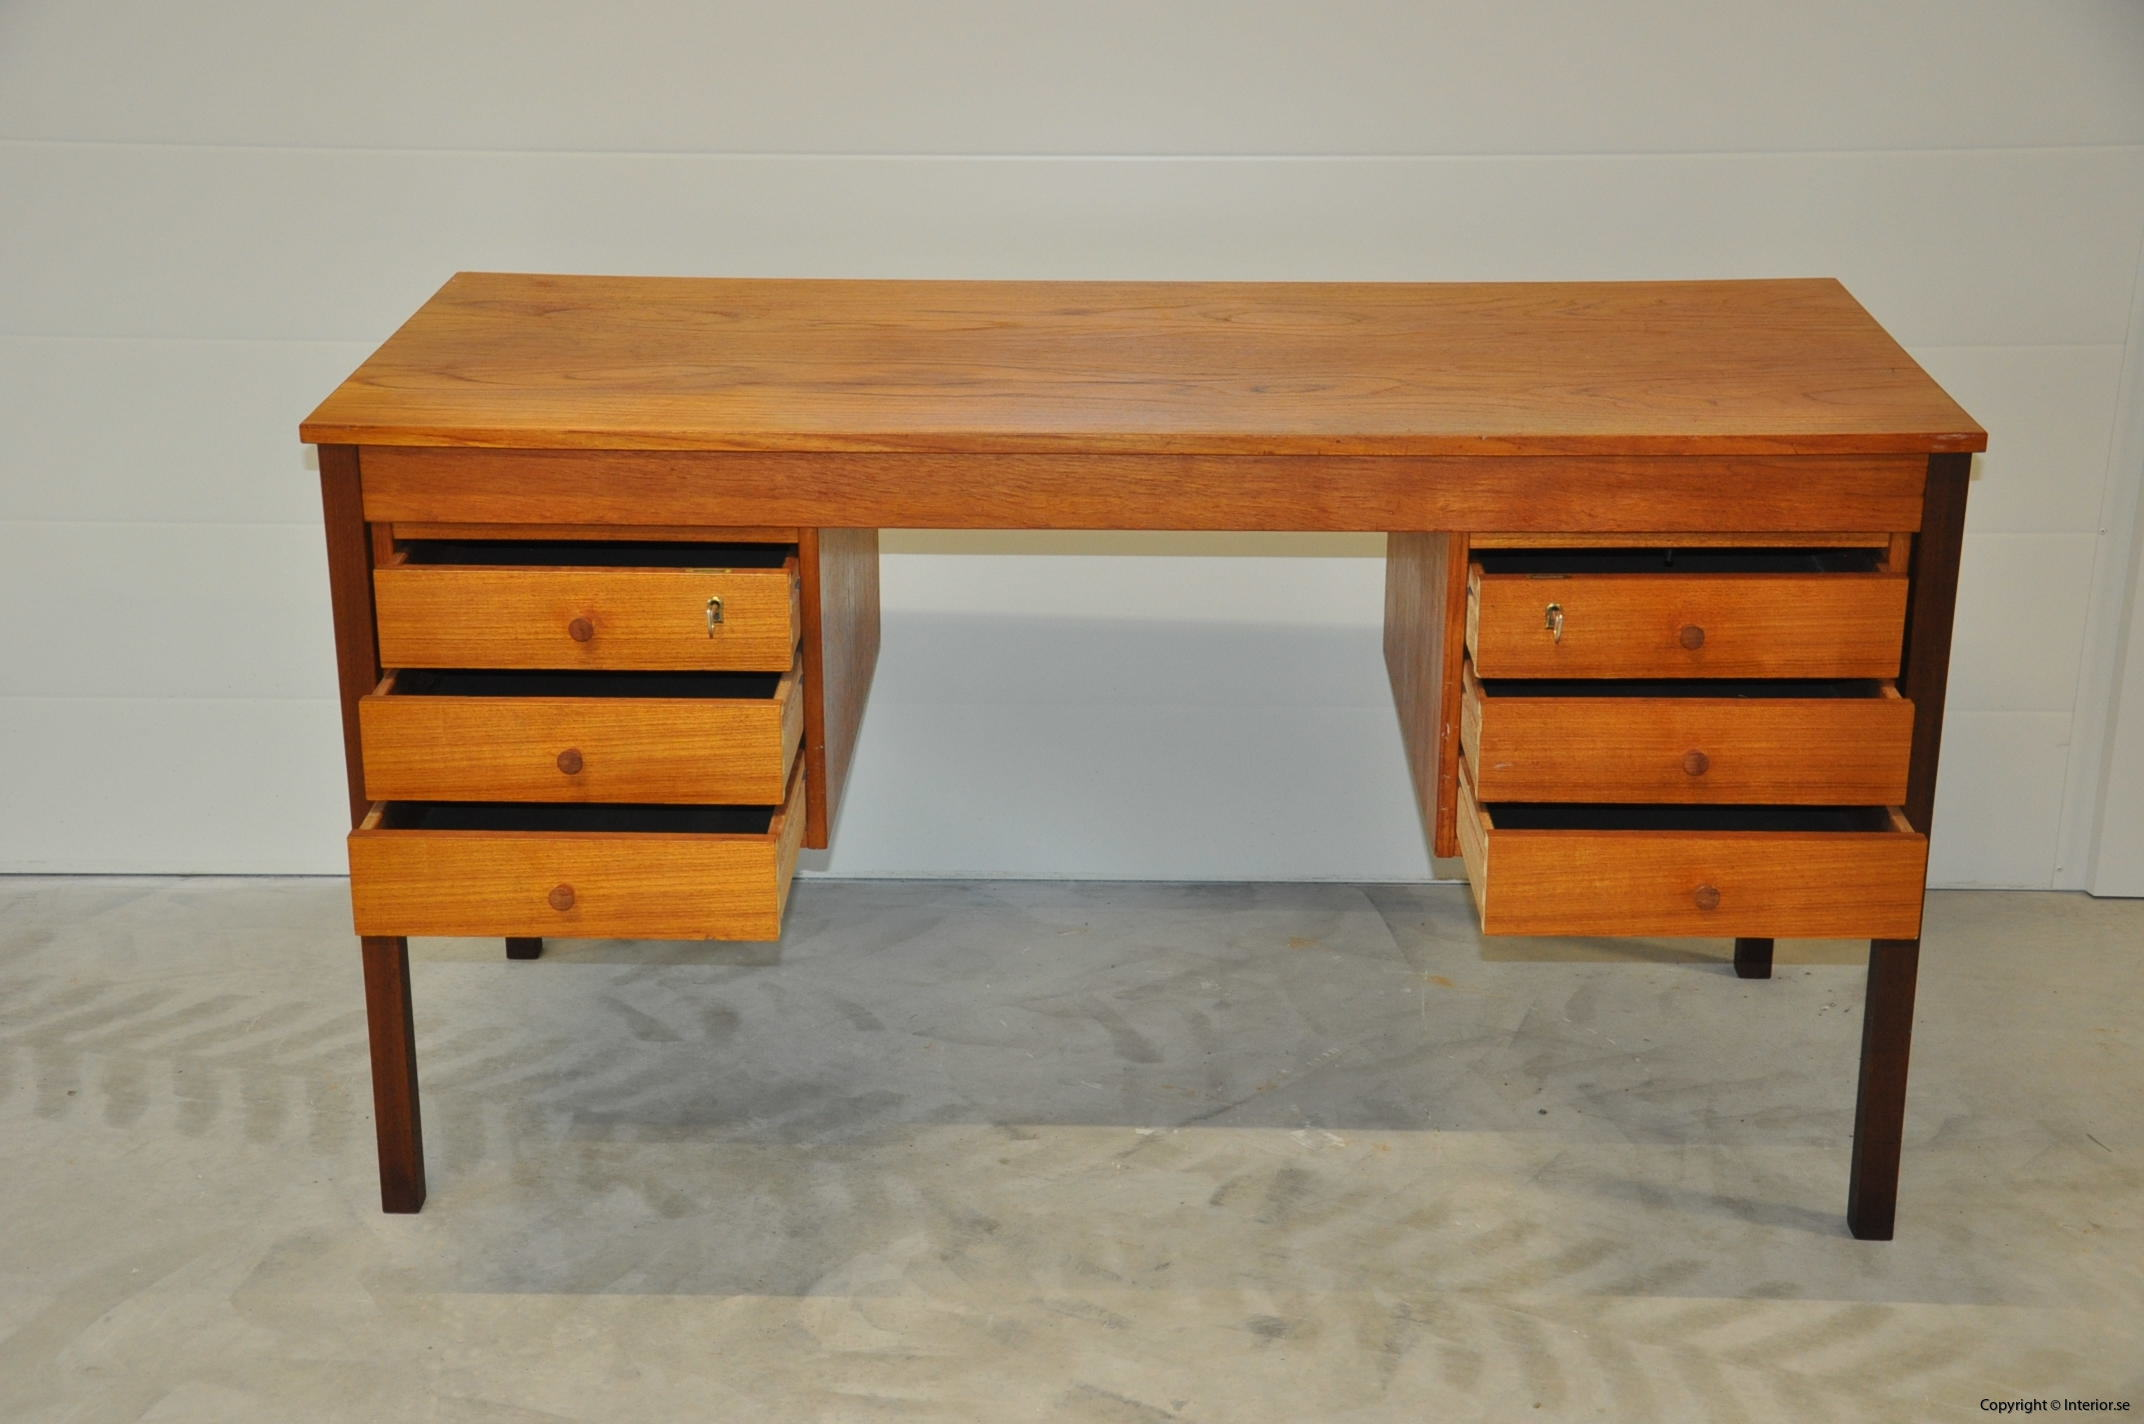 Vintage Scandinavian Desk Domino Møbler Denmark Nordic Design (4)